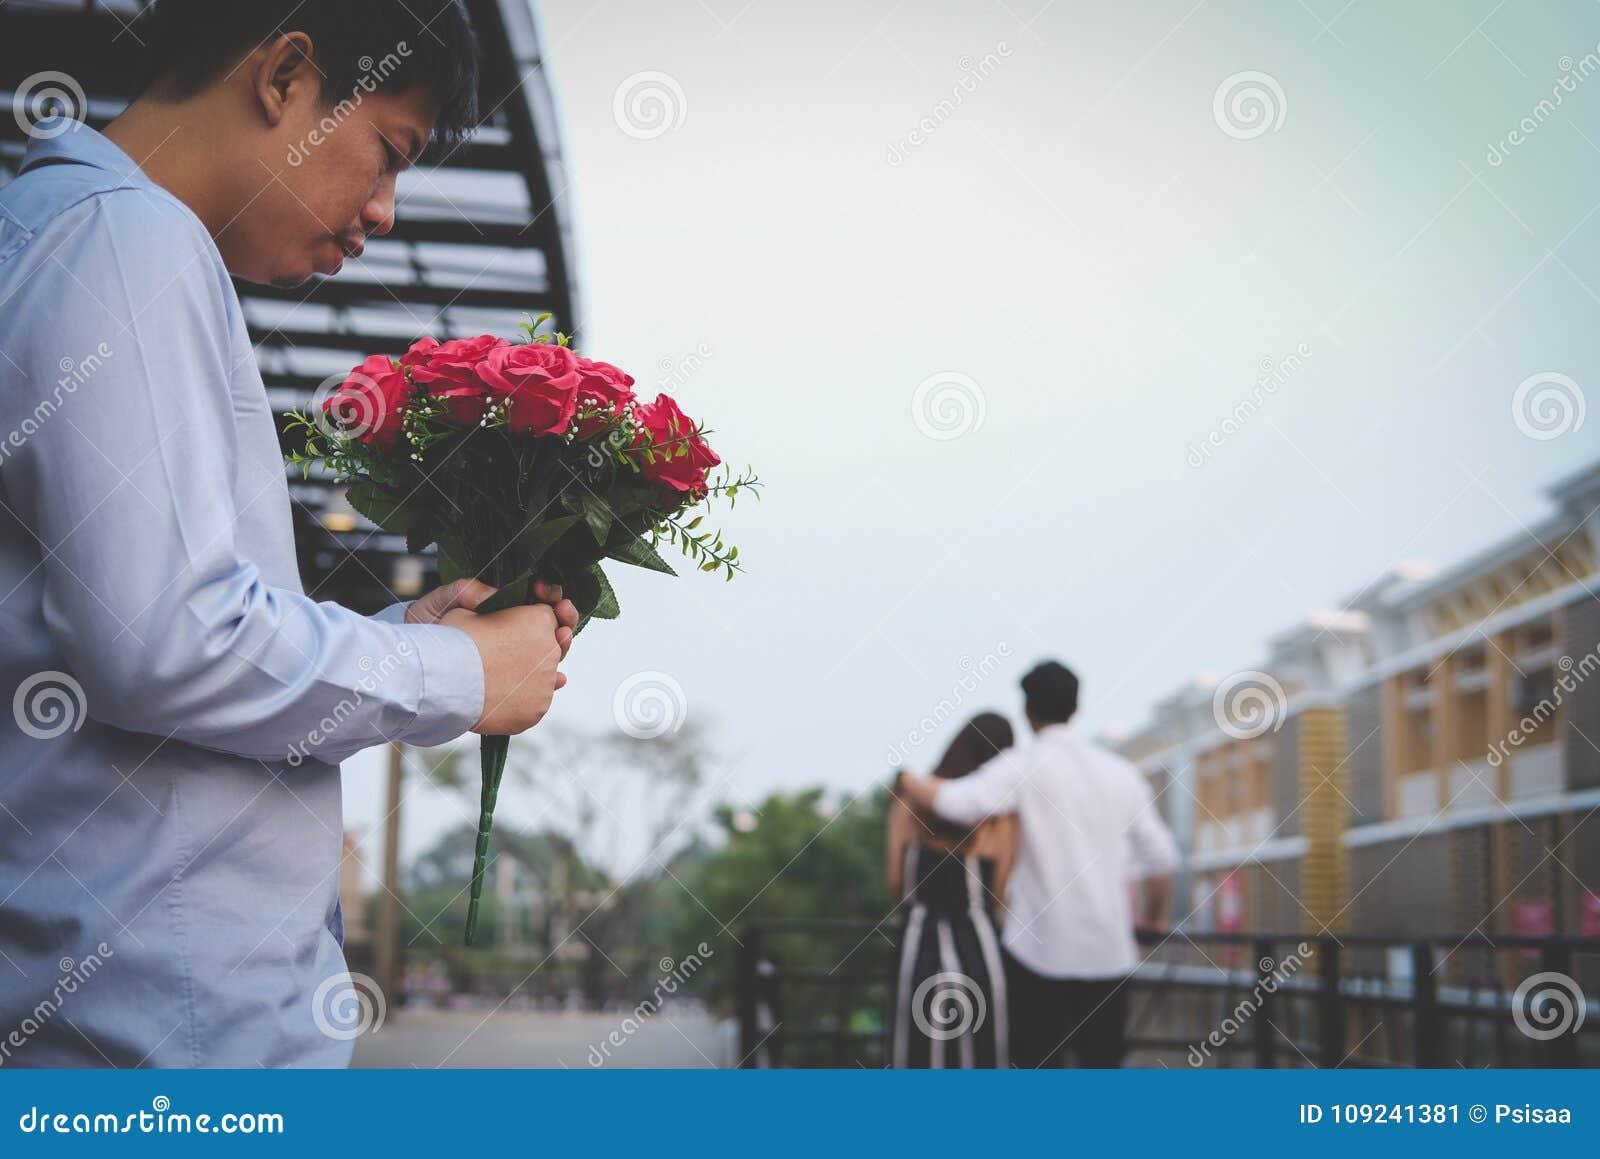 dating public transport